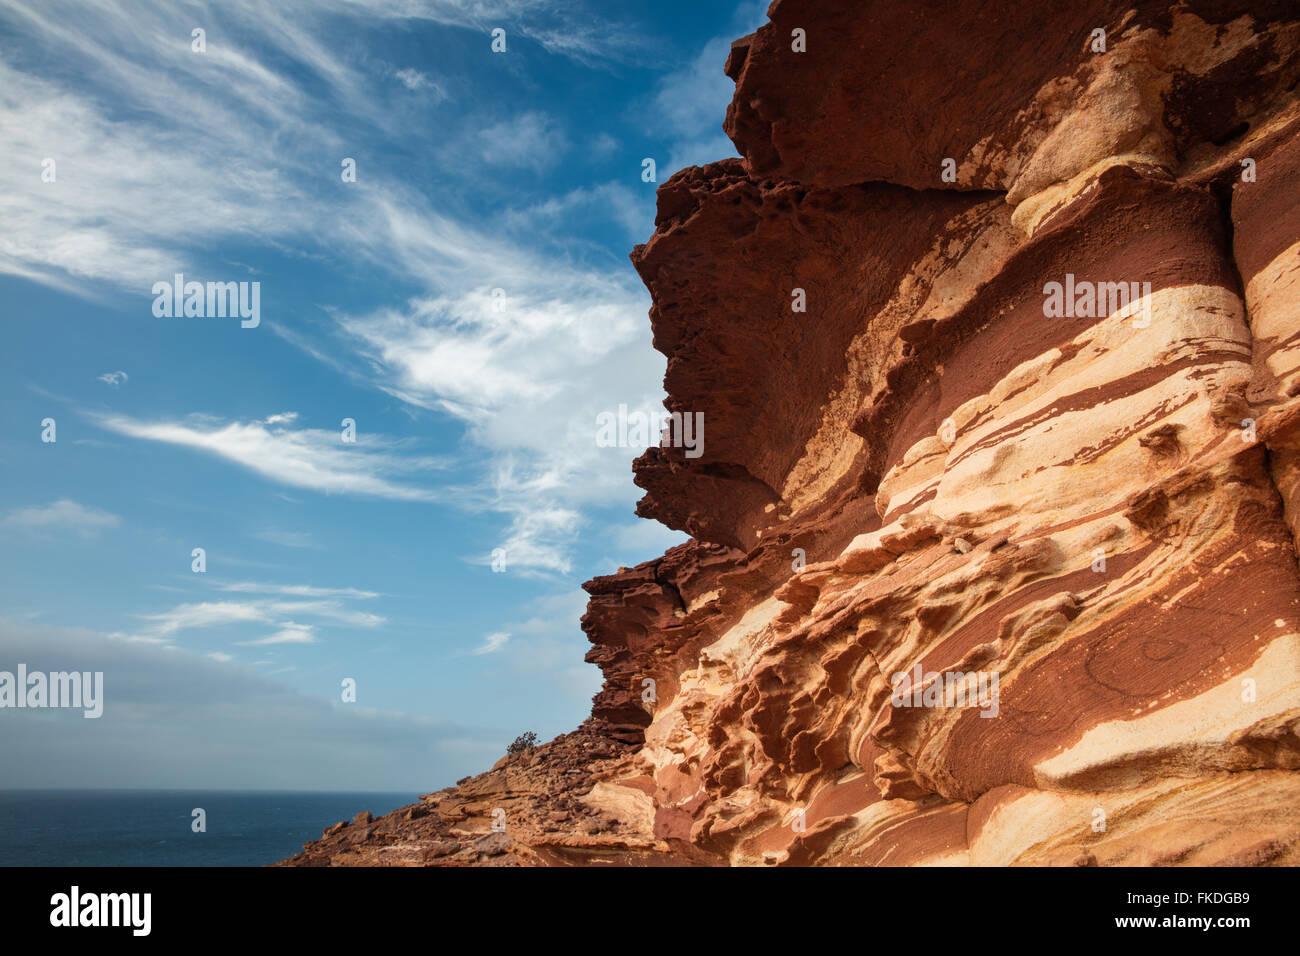 layers of rock on the coast at Kalbarri National Park, Western Australia - Stock Image